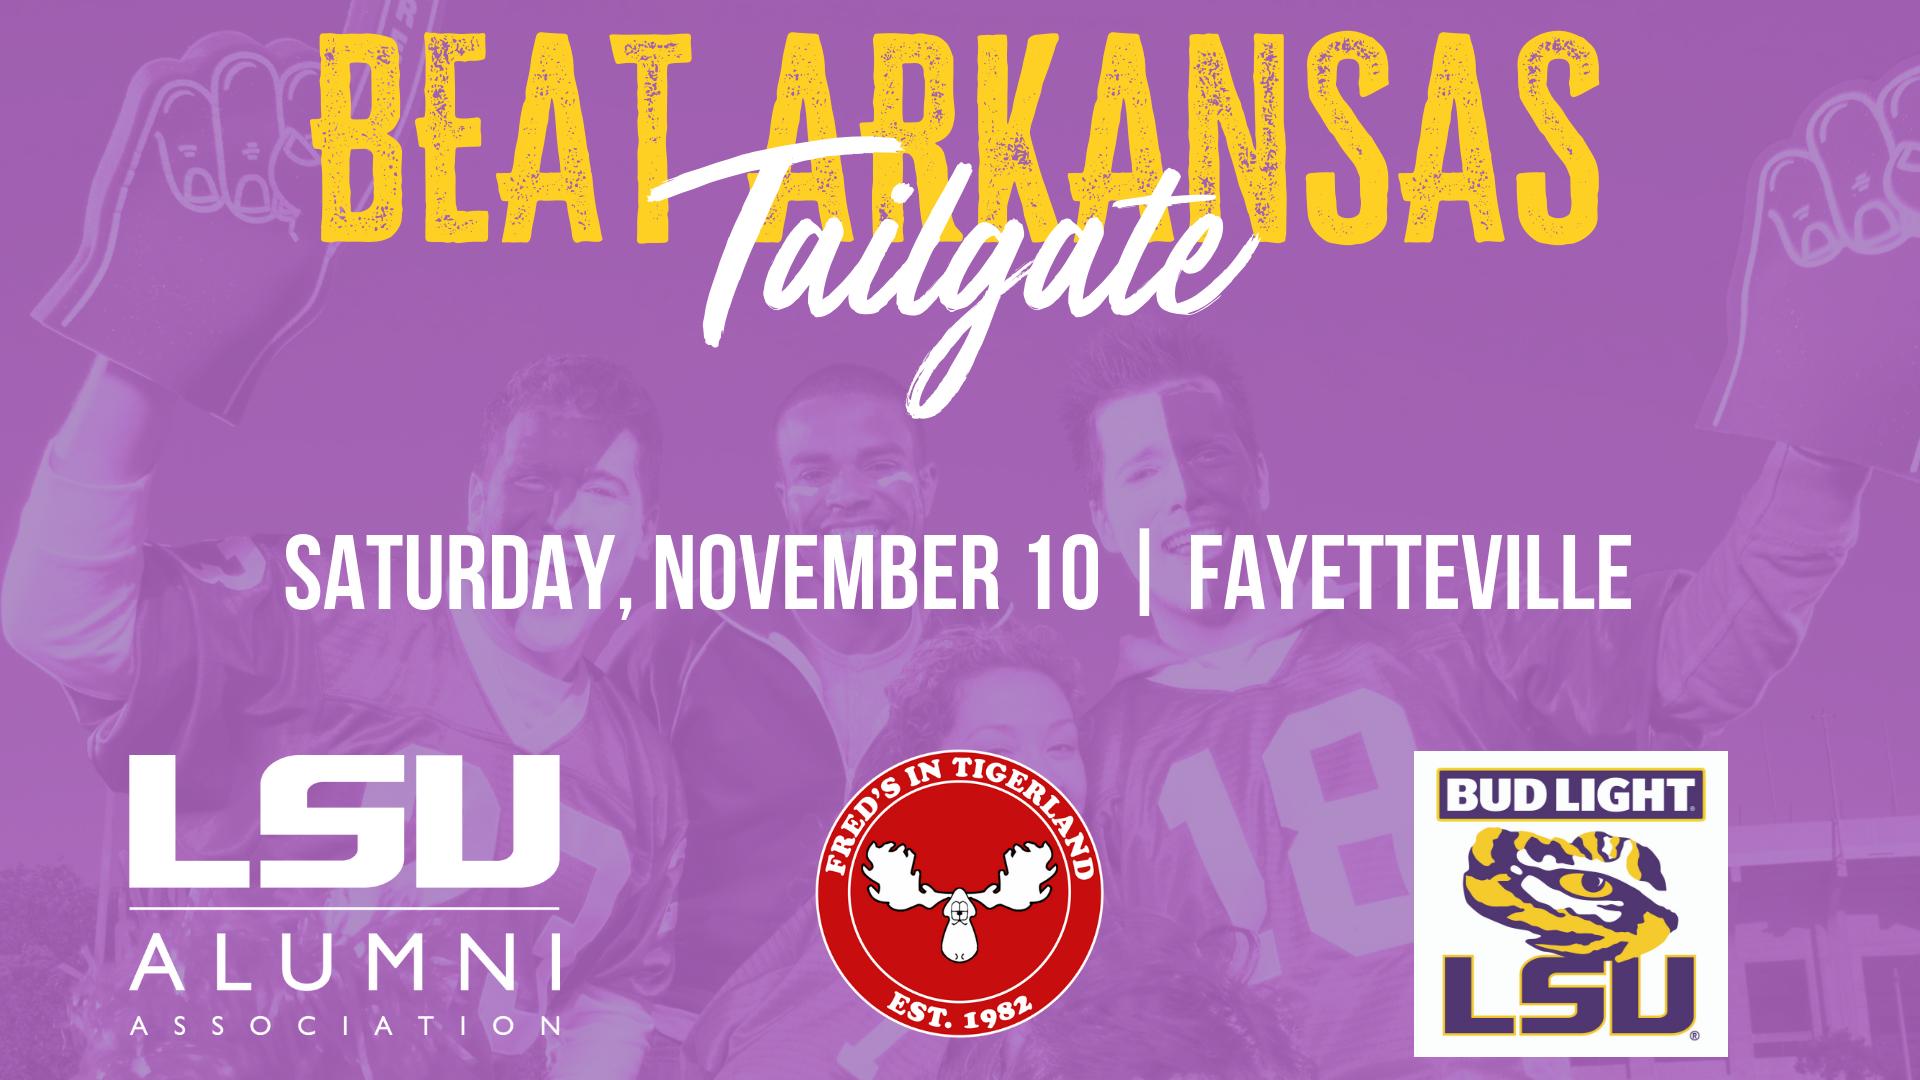 LSU vs Arkansas Tailgate Saturday, November 10